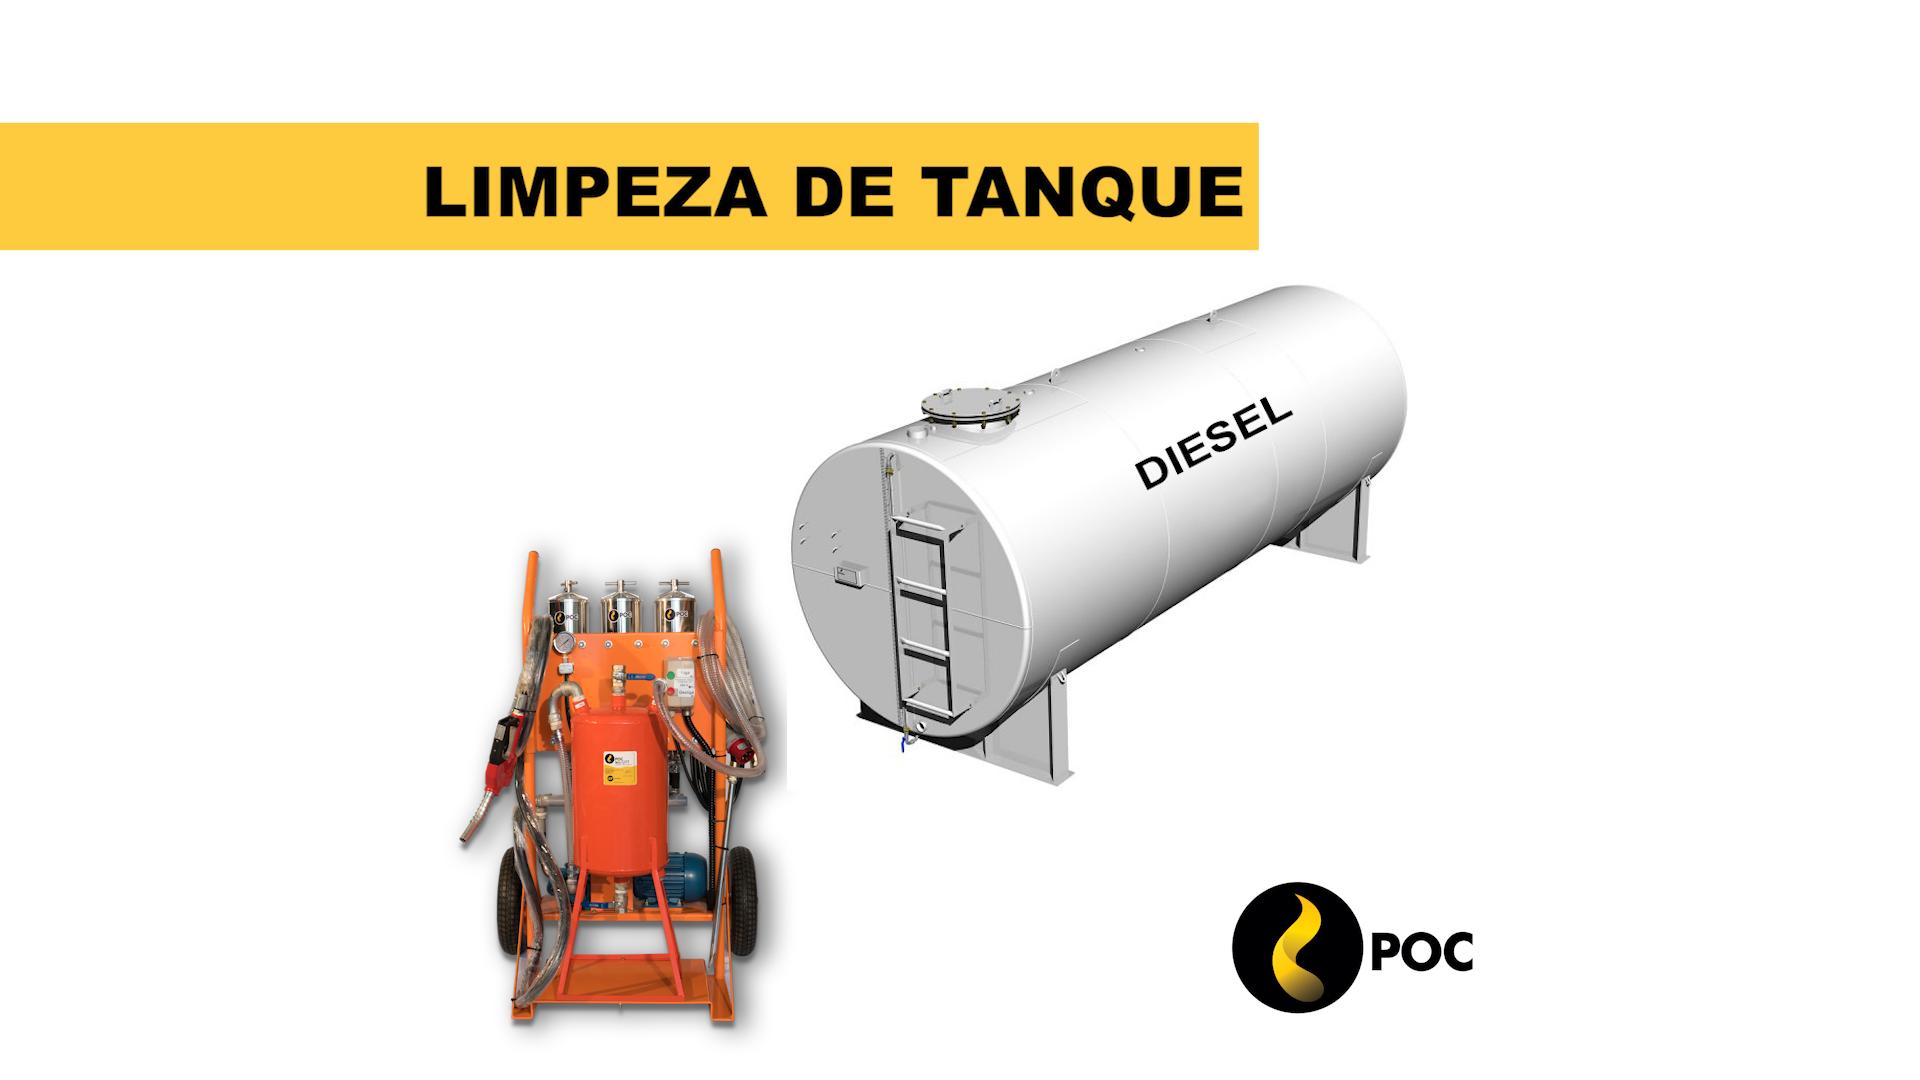 https://www.pocfiltros.com.br/wp-content/uploads/2021/03/CAPA_LIMPEZA-DE-TANQUE.png